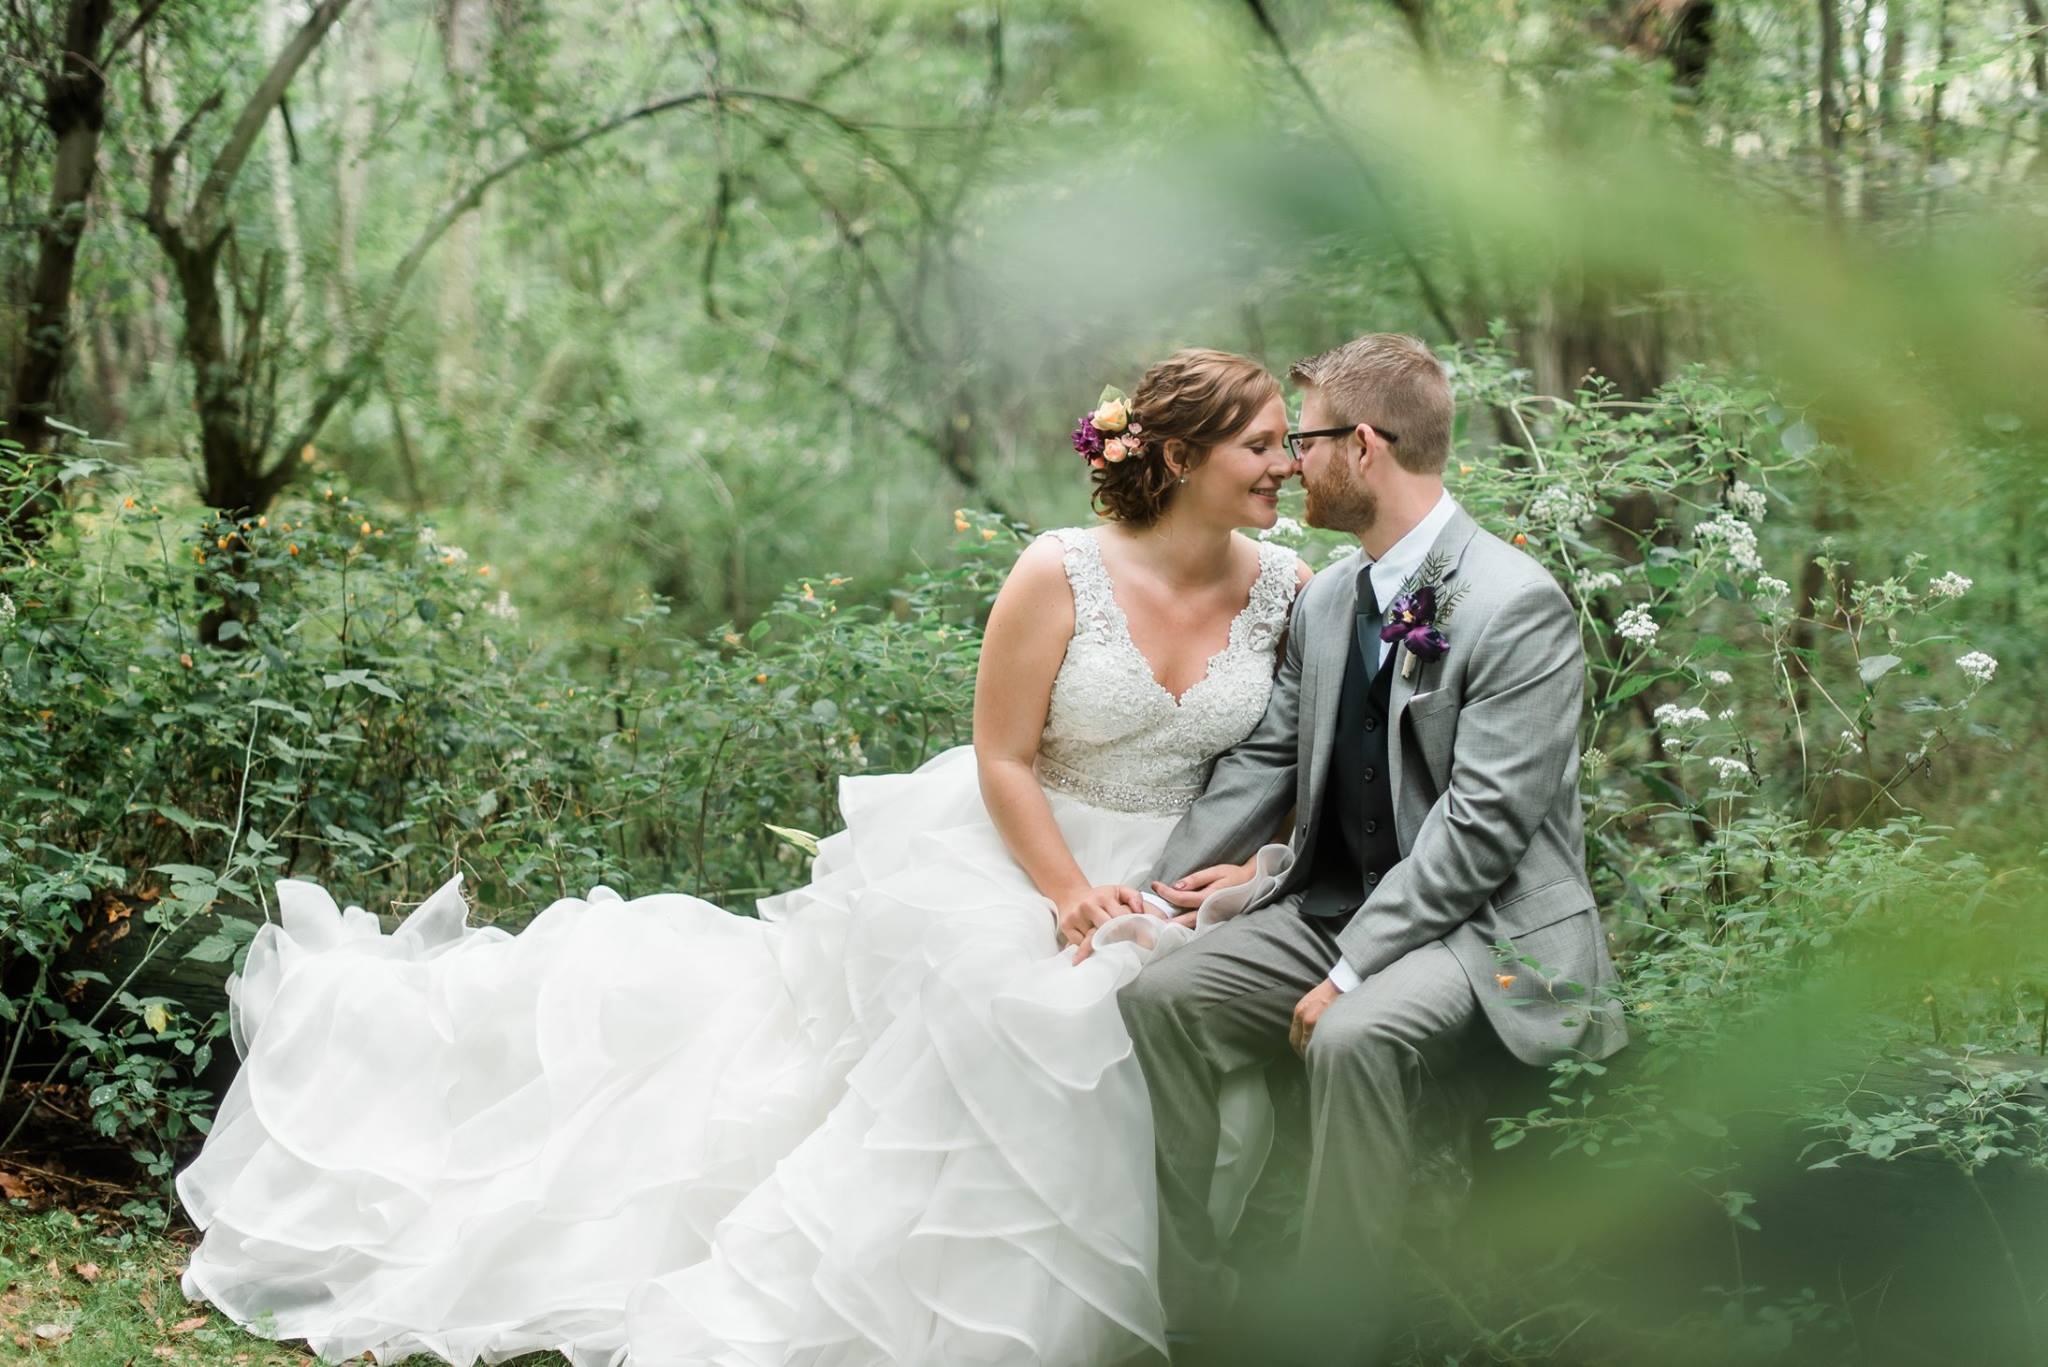 pennsylvania-backyard-wedding-love-diy-bohemian-romantic-colorful-0018.jpg